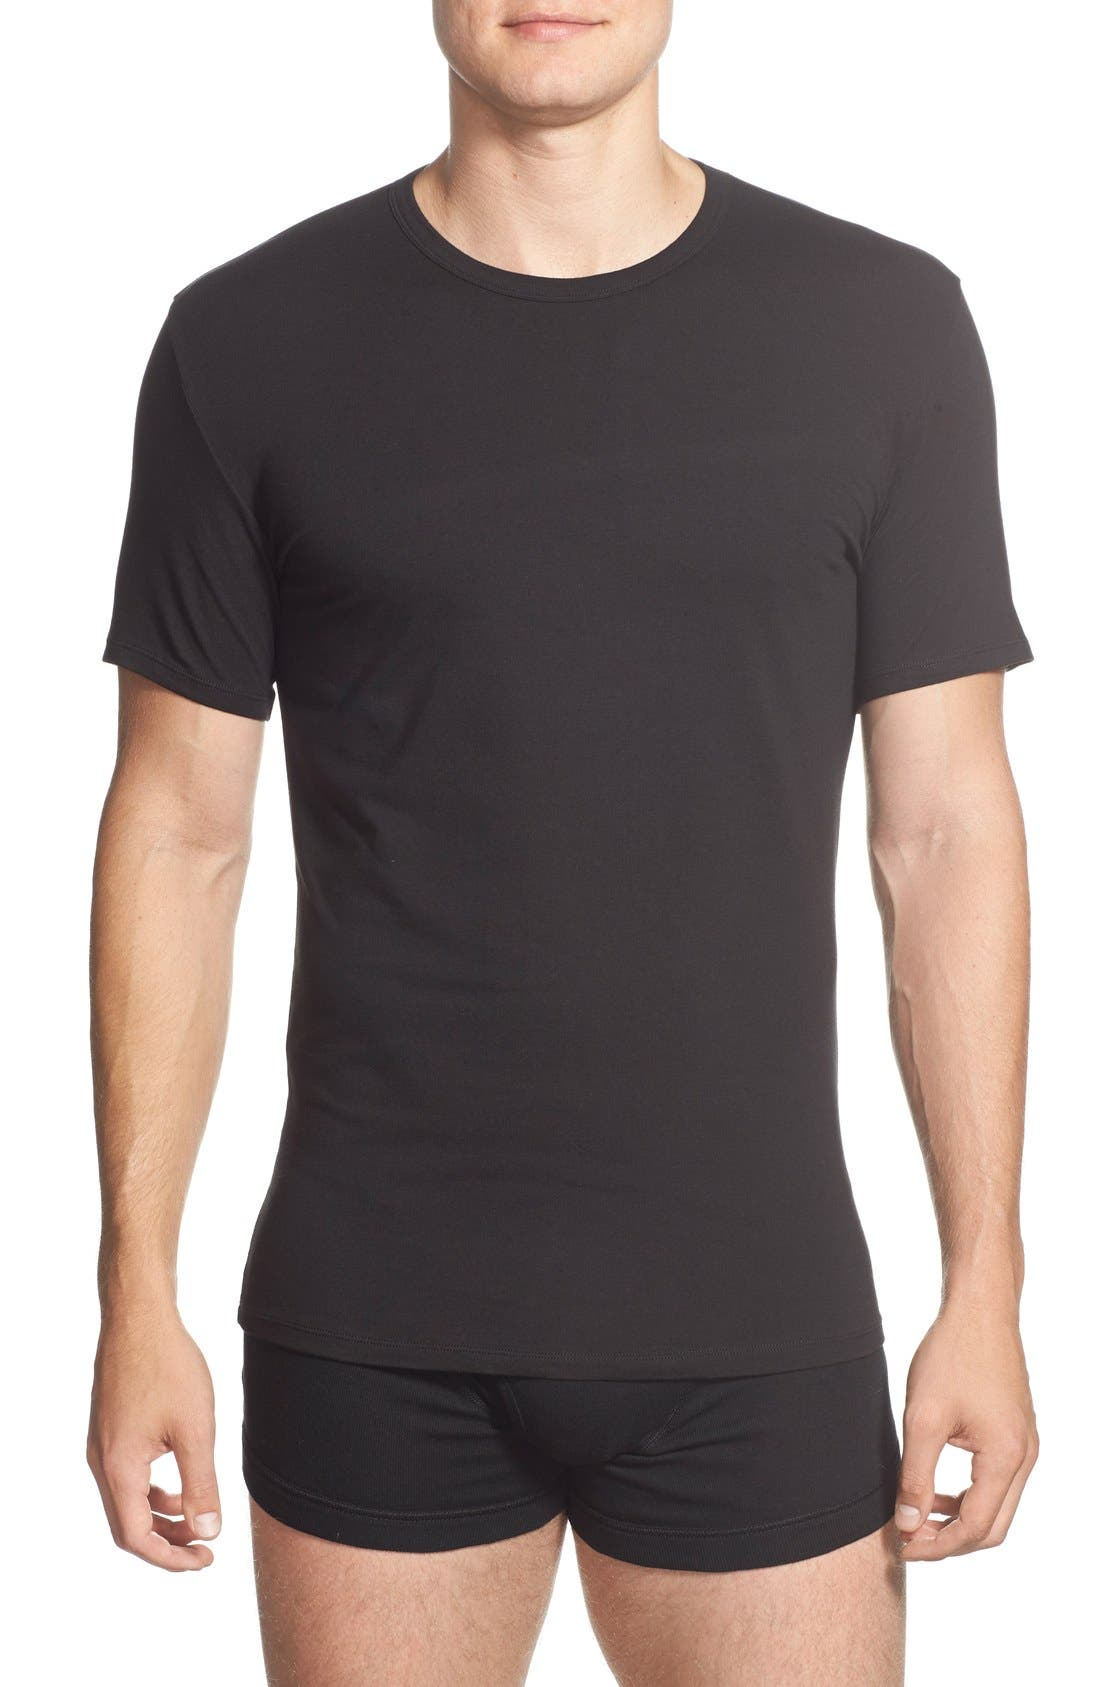 Alternate Image 1 Selected - Calvin Klein 2-Pack Stretch Cotton Crewneck T-Shirt